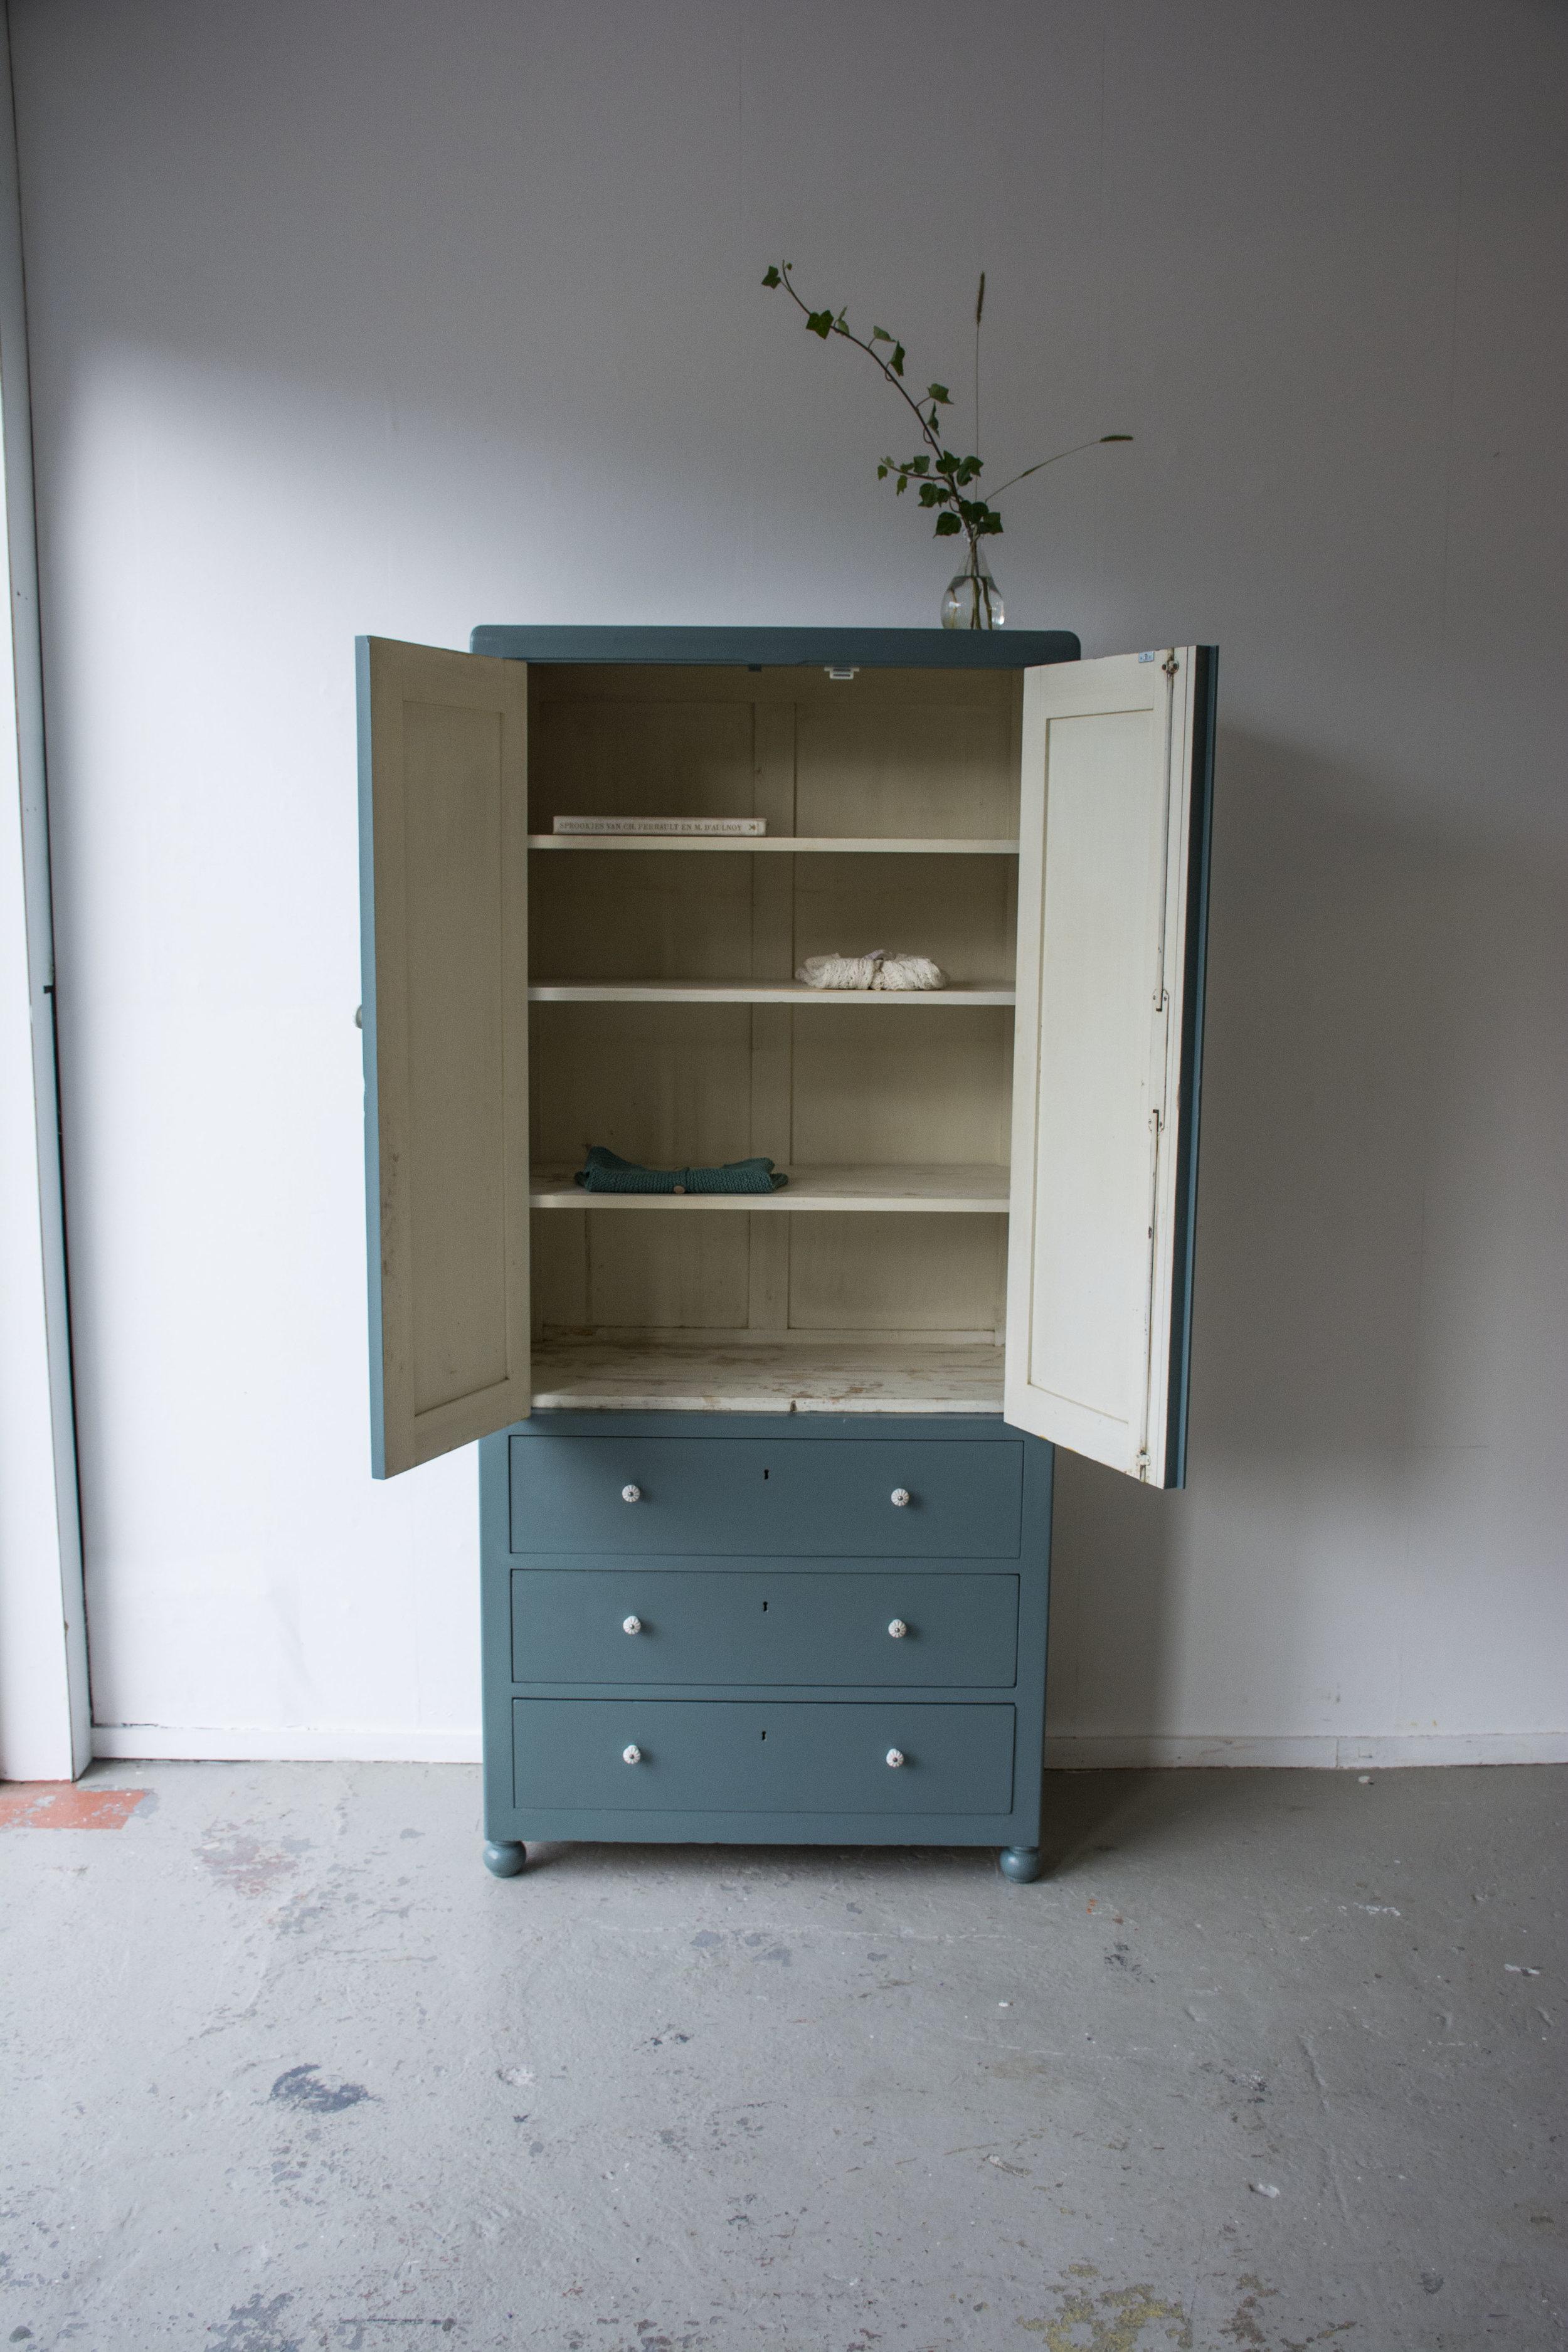 Inchyra kledingkast met 3 laden - Firma Zoethout_2.jpg